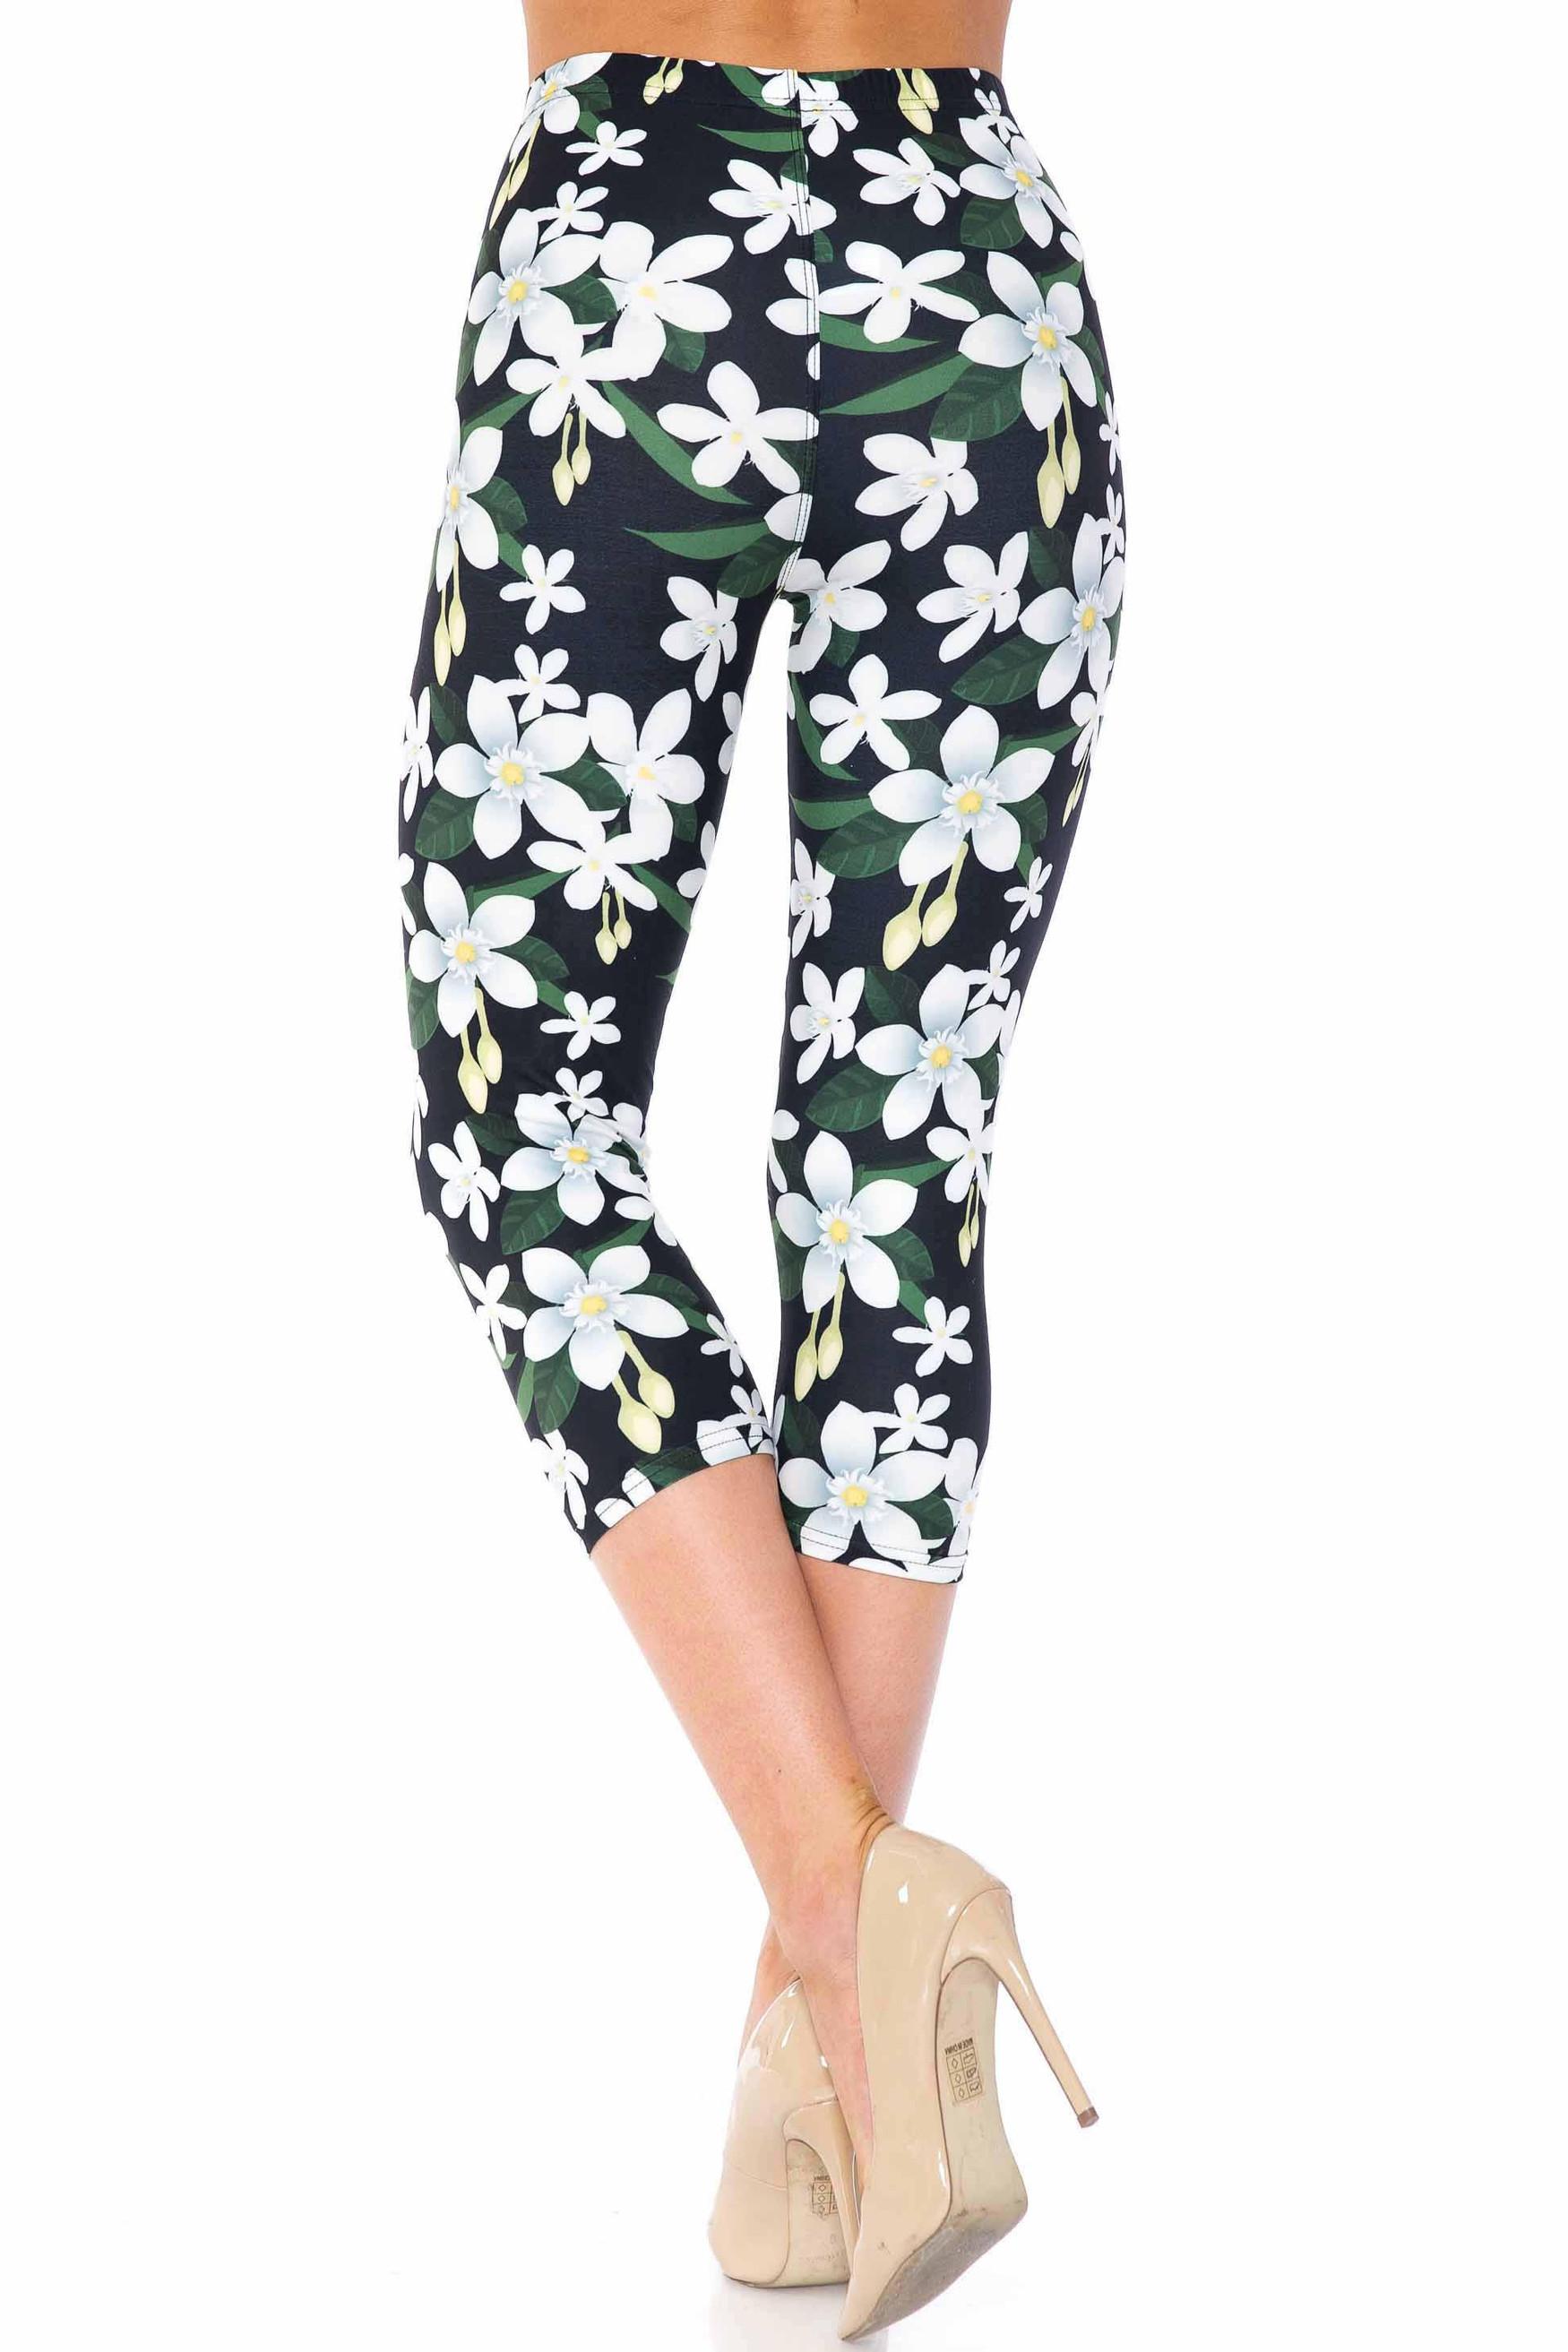 Creamy Soft Daisy Bloom Capris - USA Fashion™